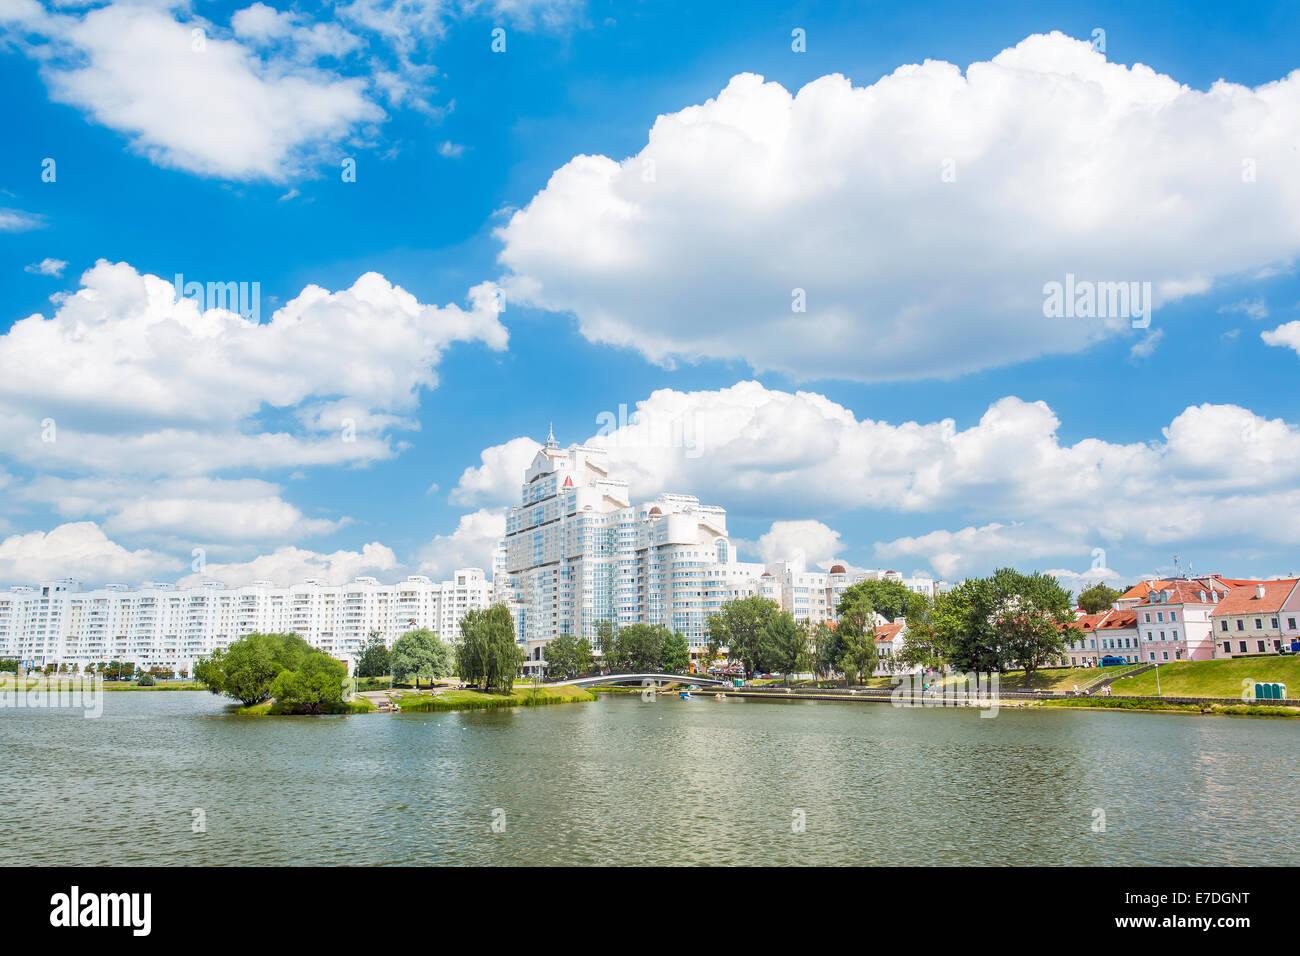 Nemiga district and Svisloch river in Minsk, Belarus - Stock Image